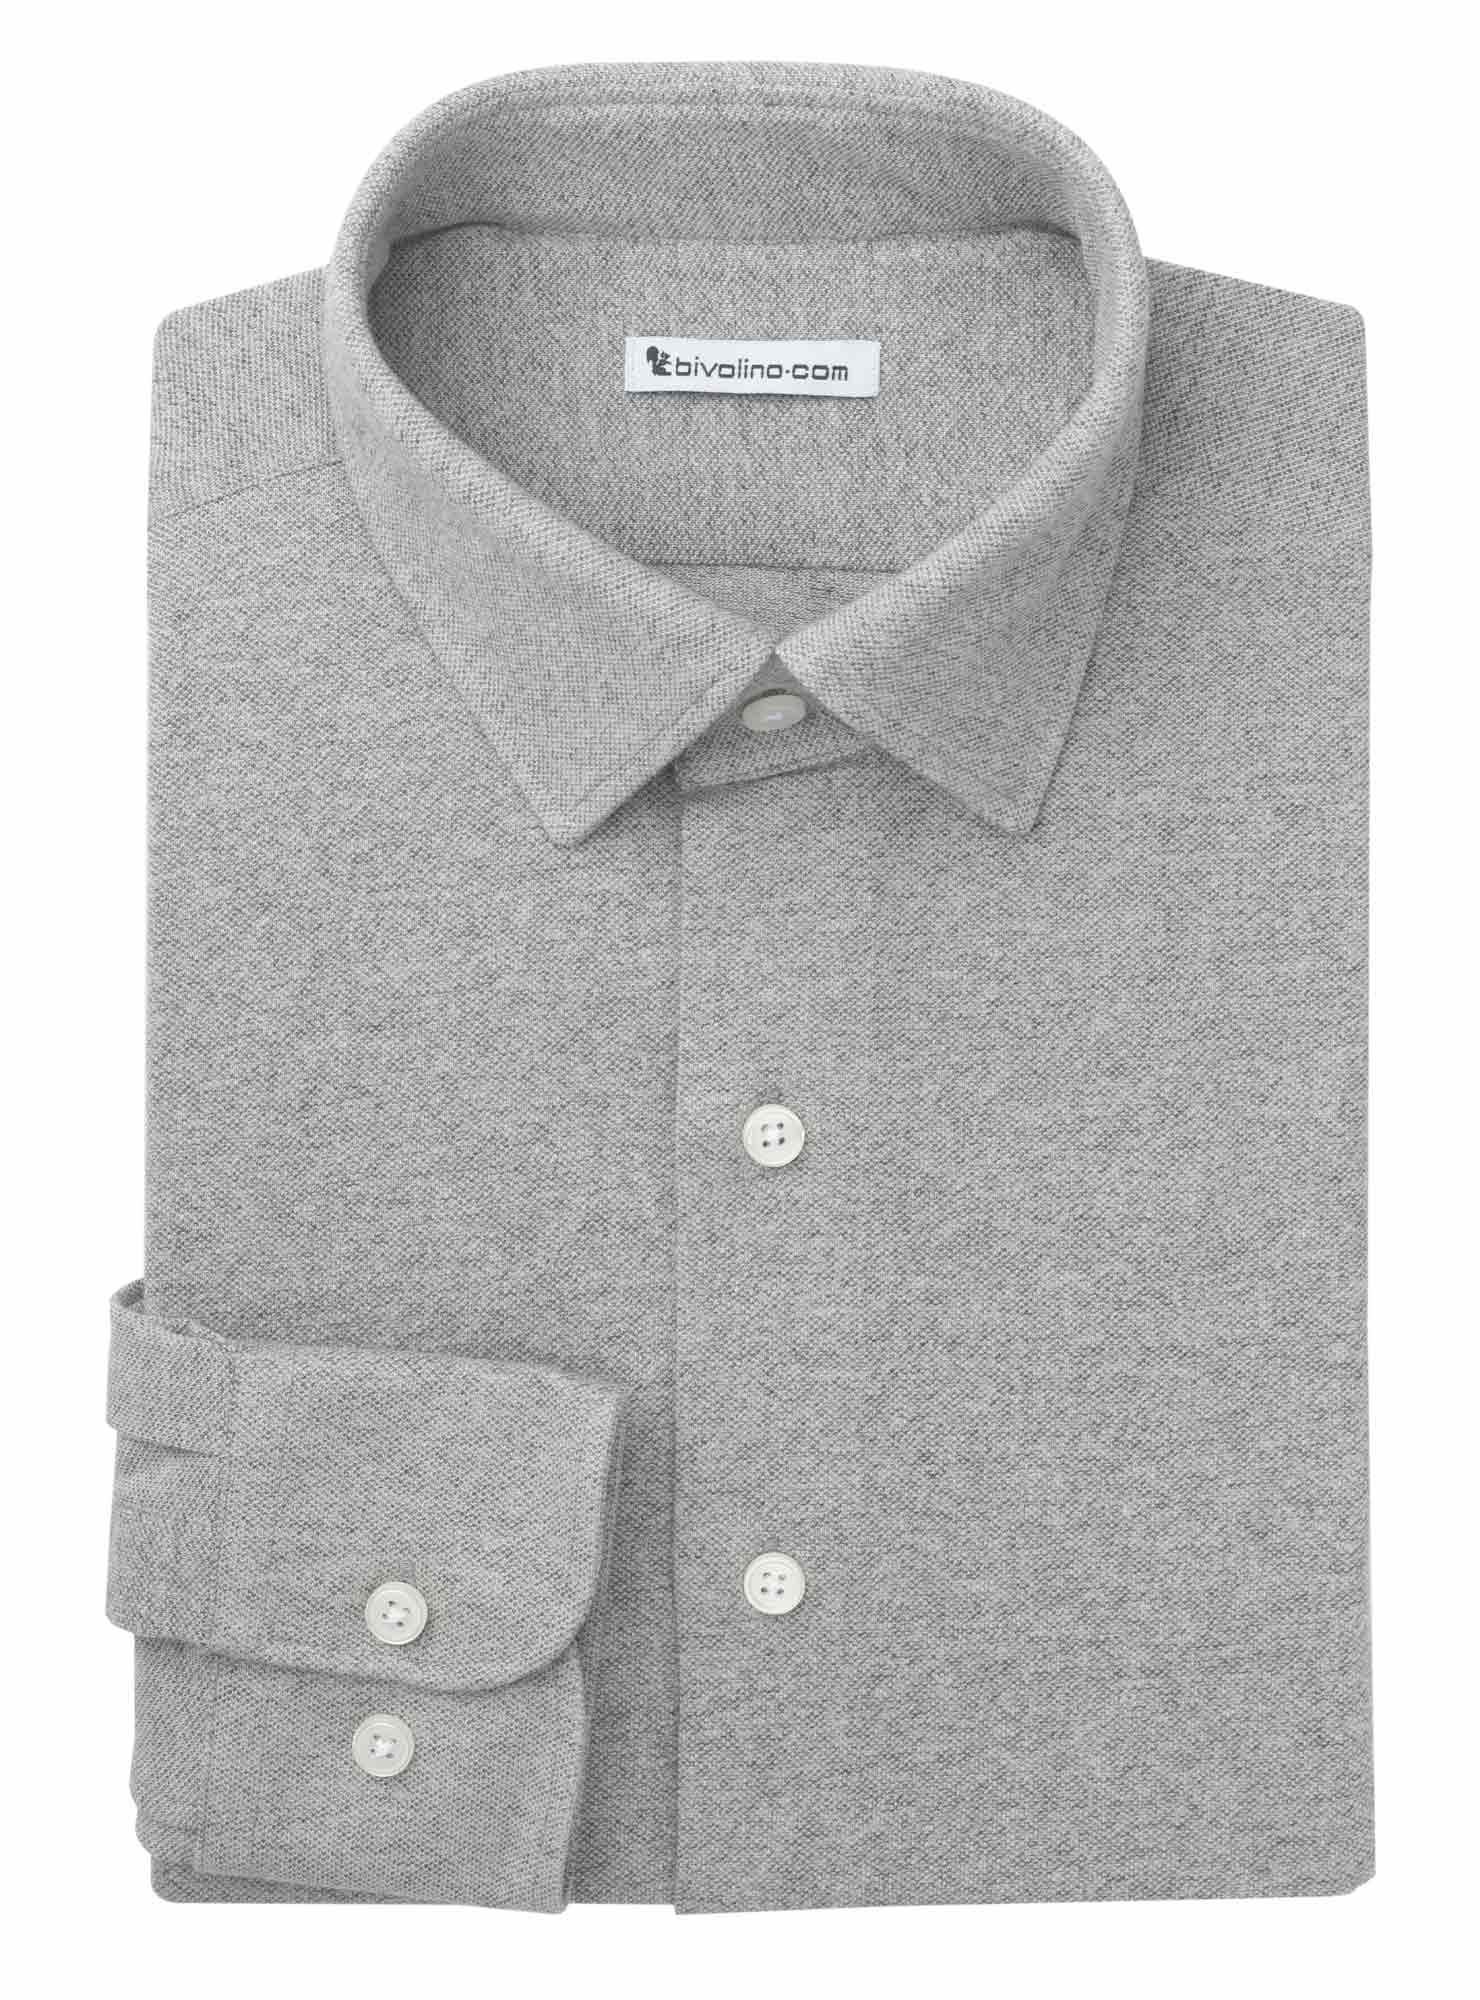 FORLì - 100% Baumwolle Piqué Jersey grau Herren Hemd - JERSILI 3